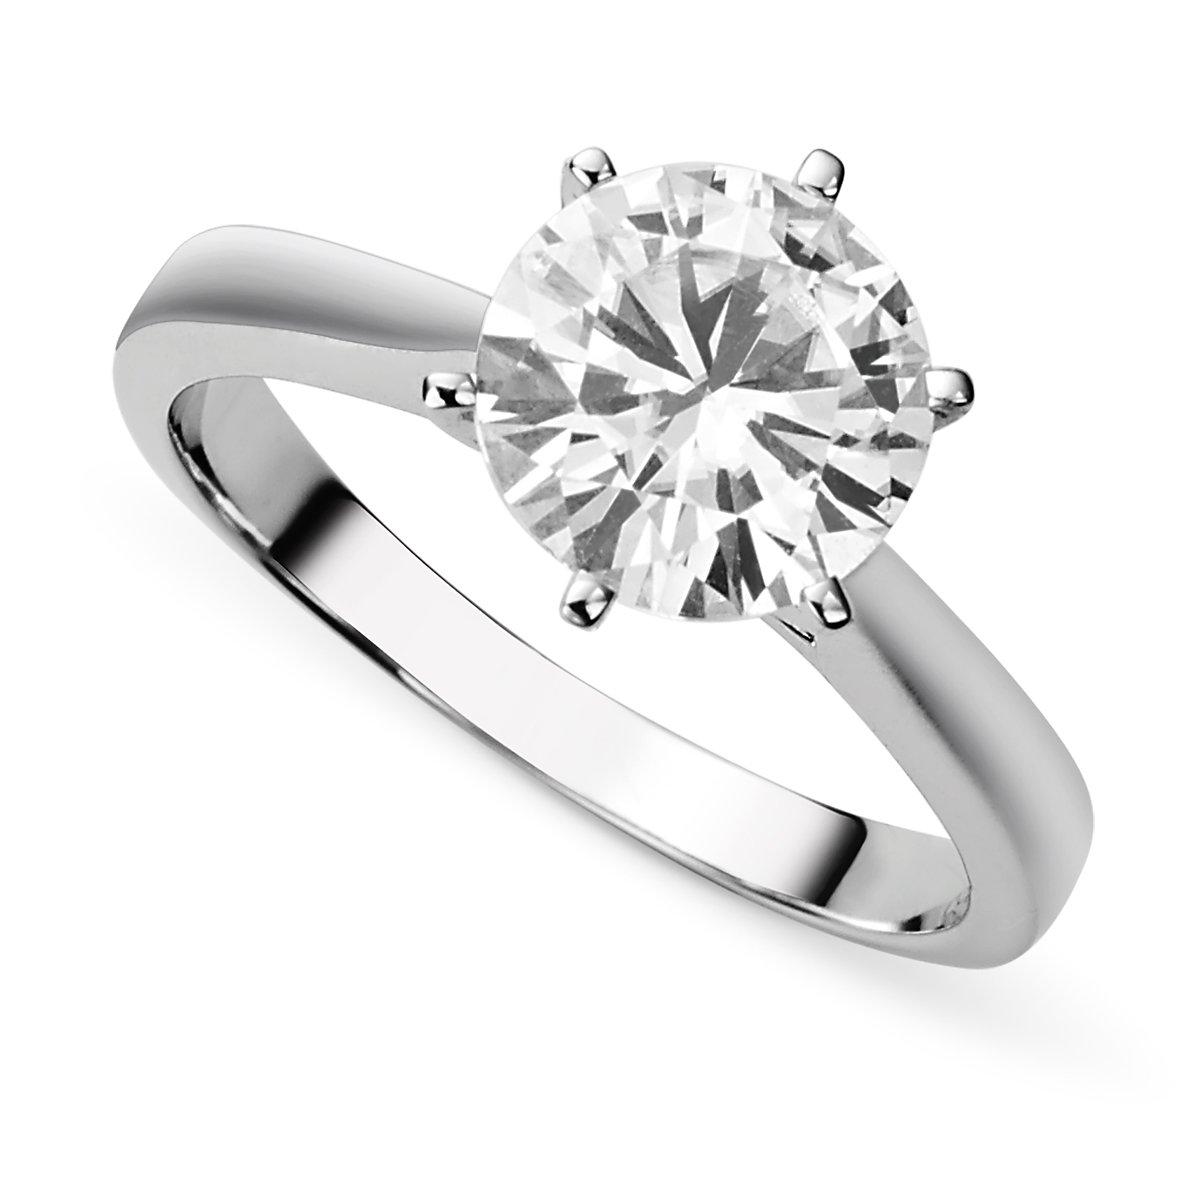 Forever Brilliant White Gold 7.5mm Moissanite Engagement Ring size 5, 1.50ct DEW By Charles & Colvard